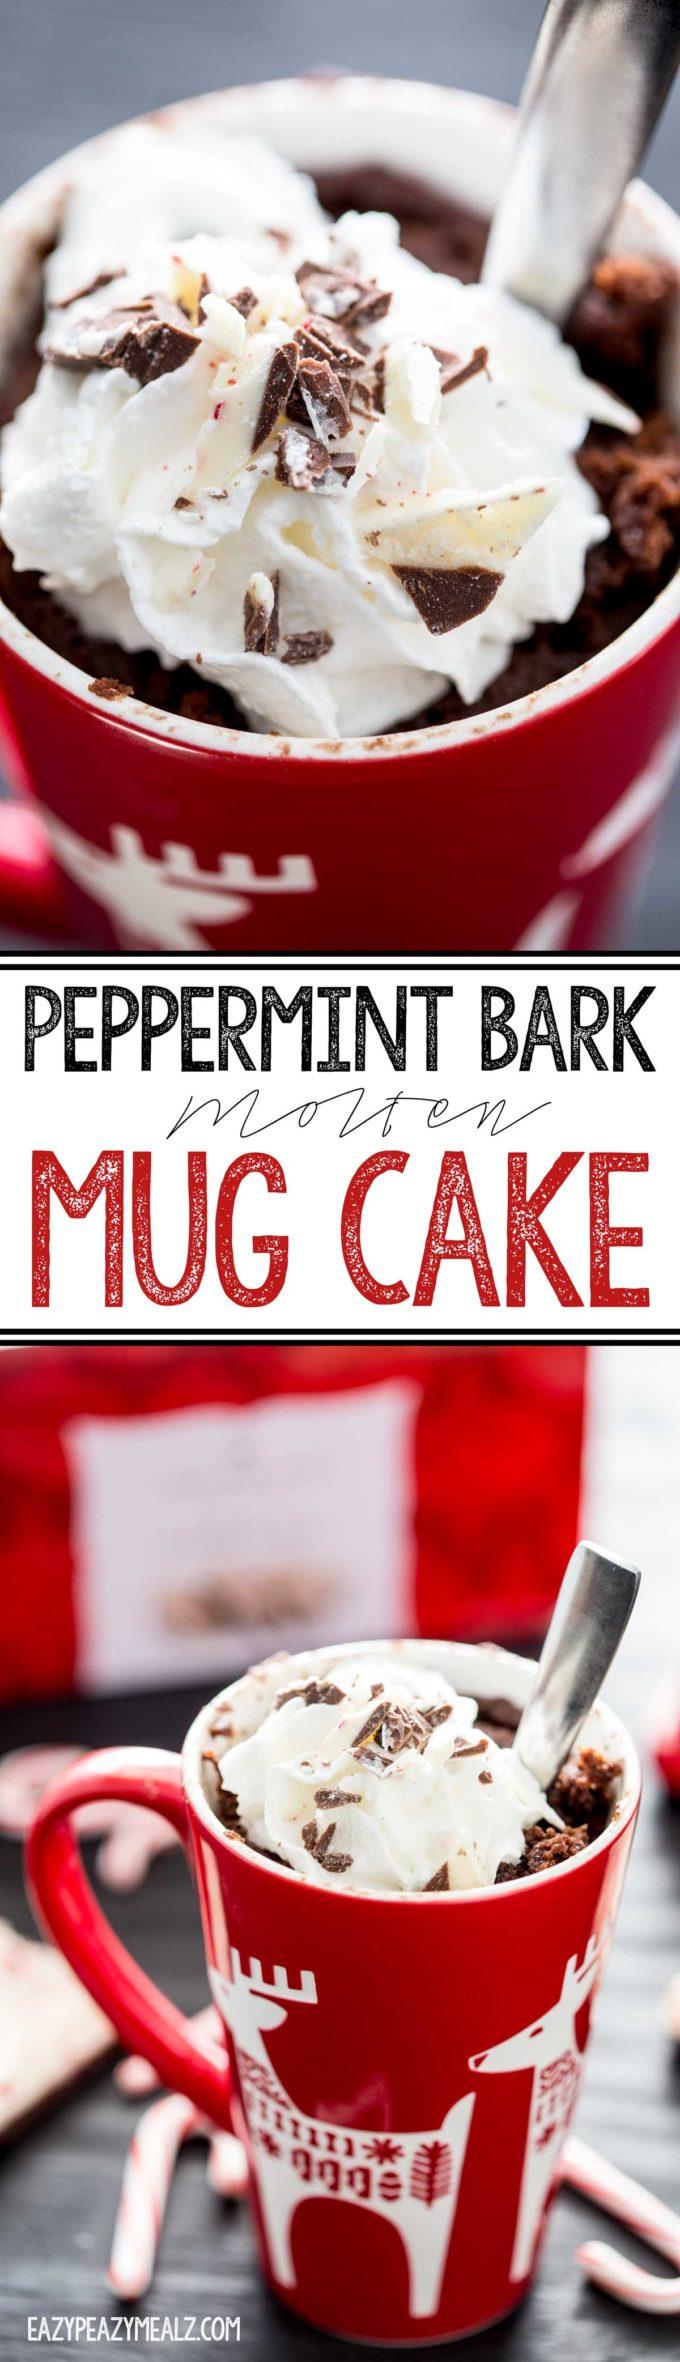 Peppermint Bark Lava Mug Cake is a quick single serve delicious dessert, a holiday dessert